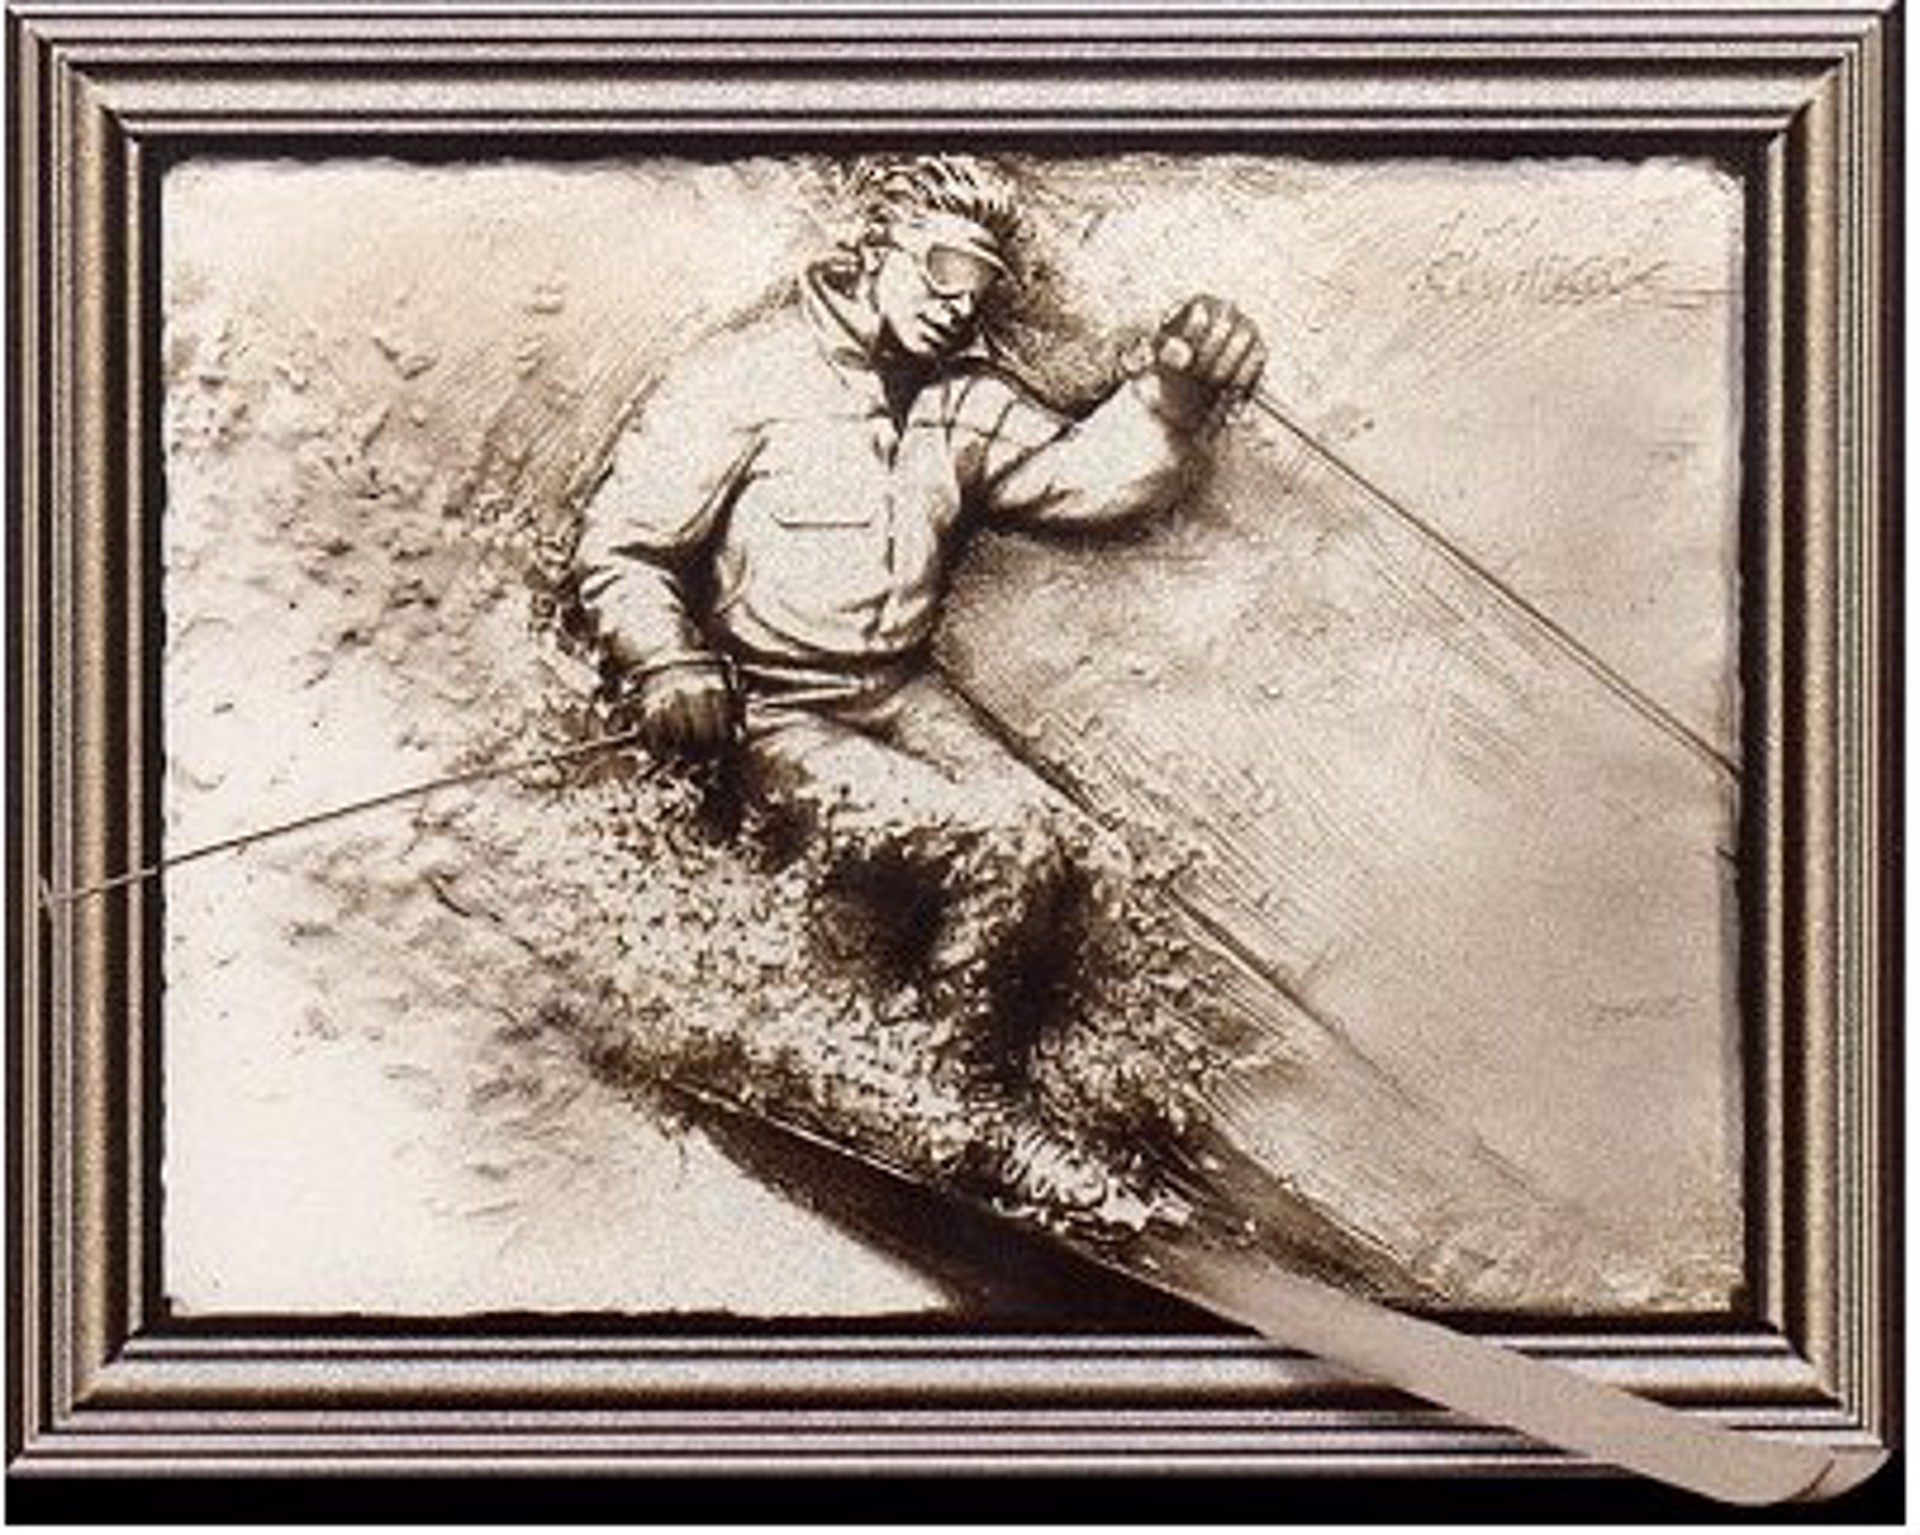 Downhill Male by Bill Mack